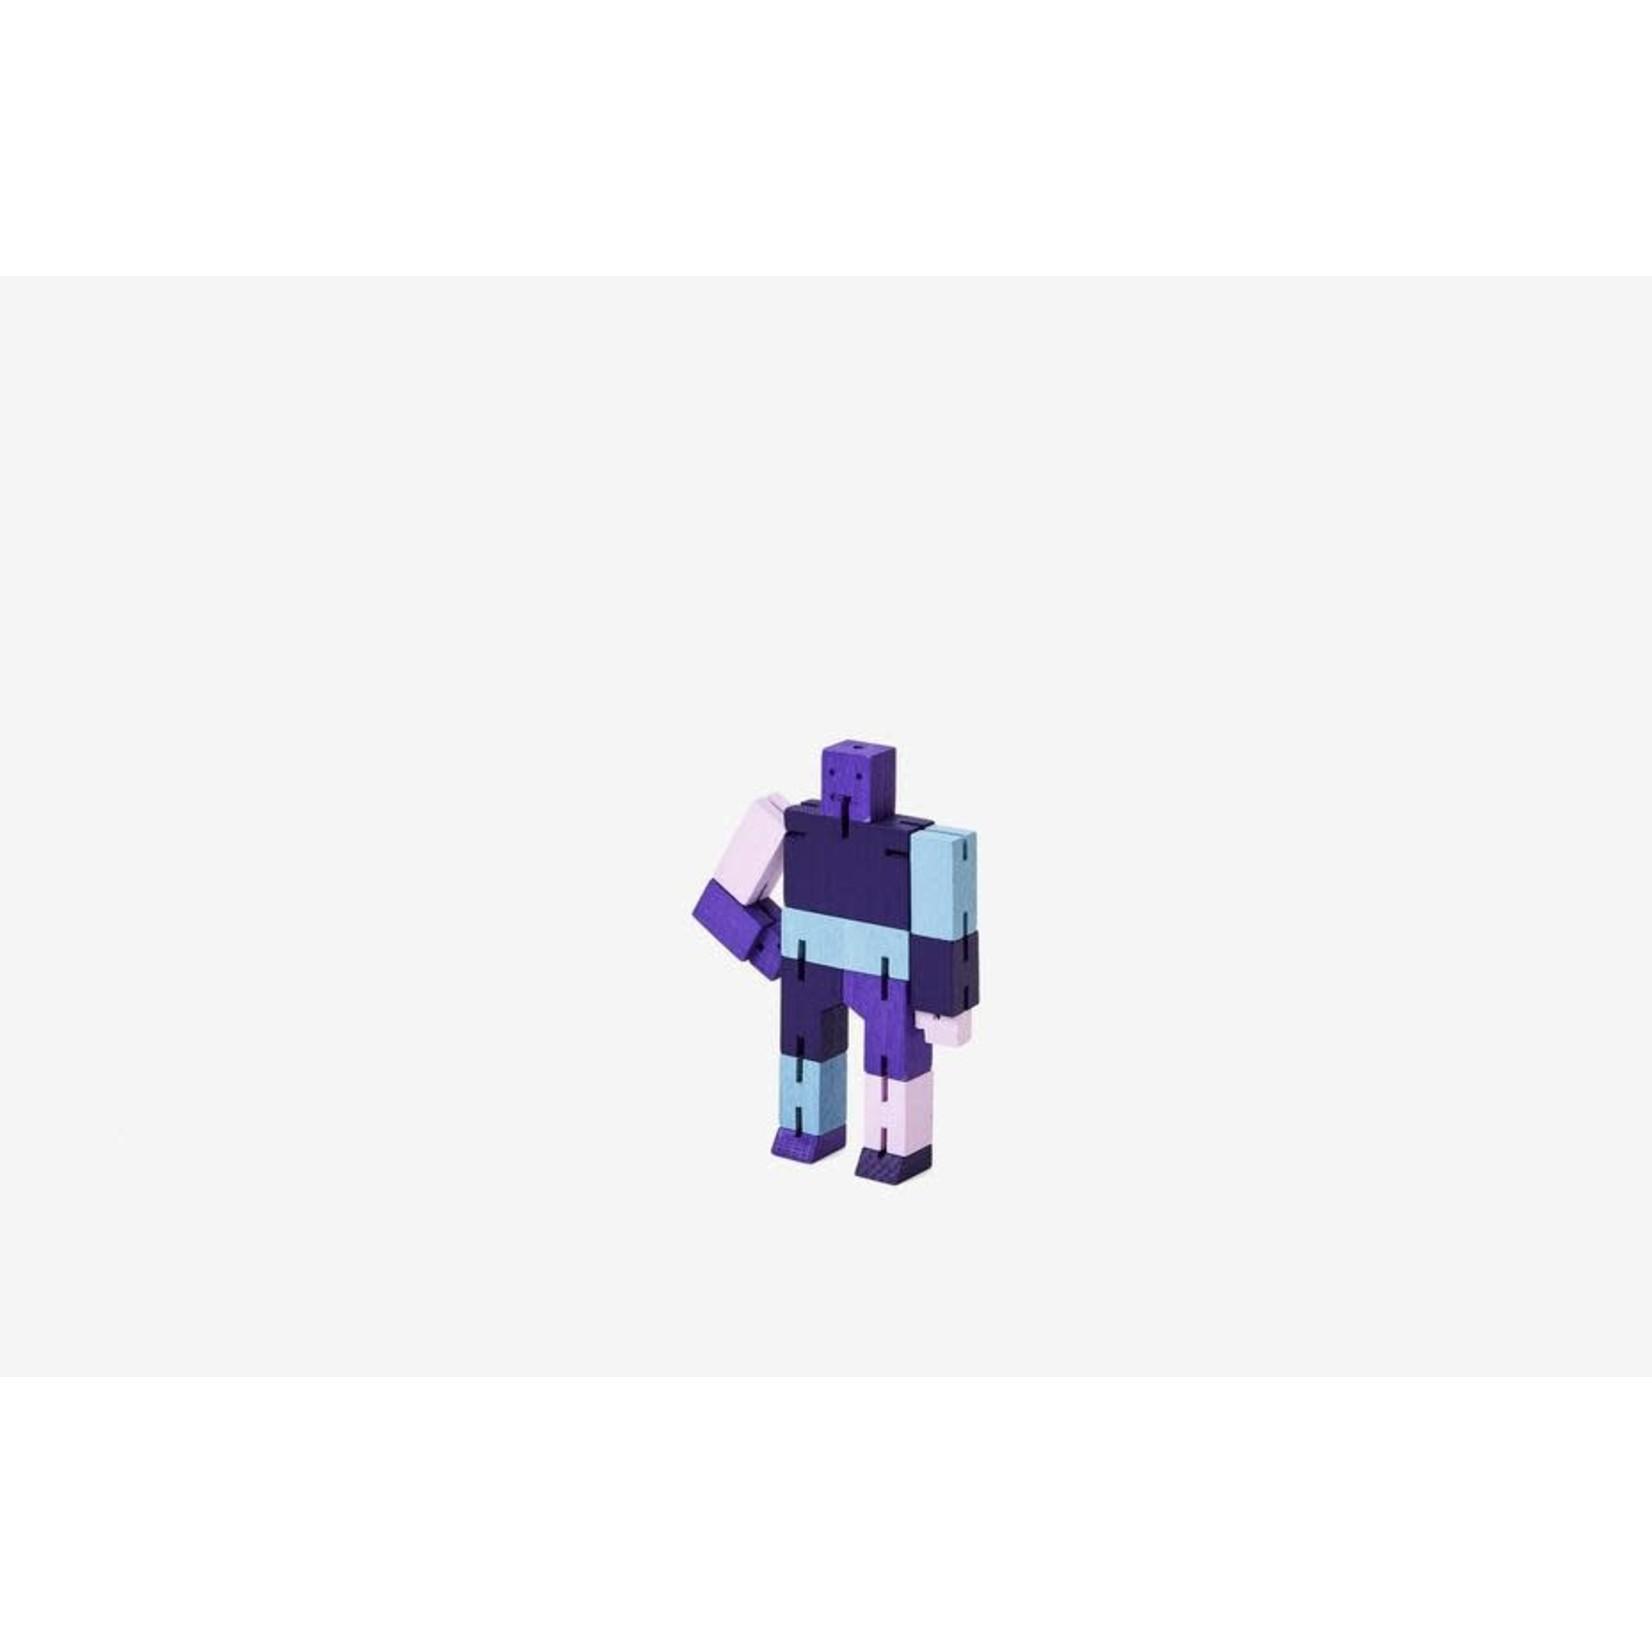 Areaware Cubebot Micro (Purple Multi)